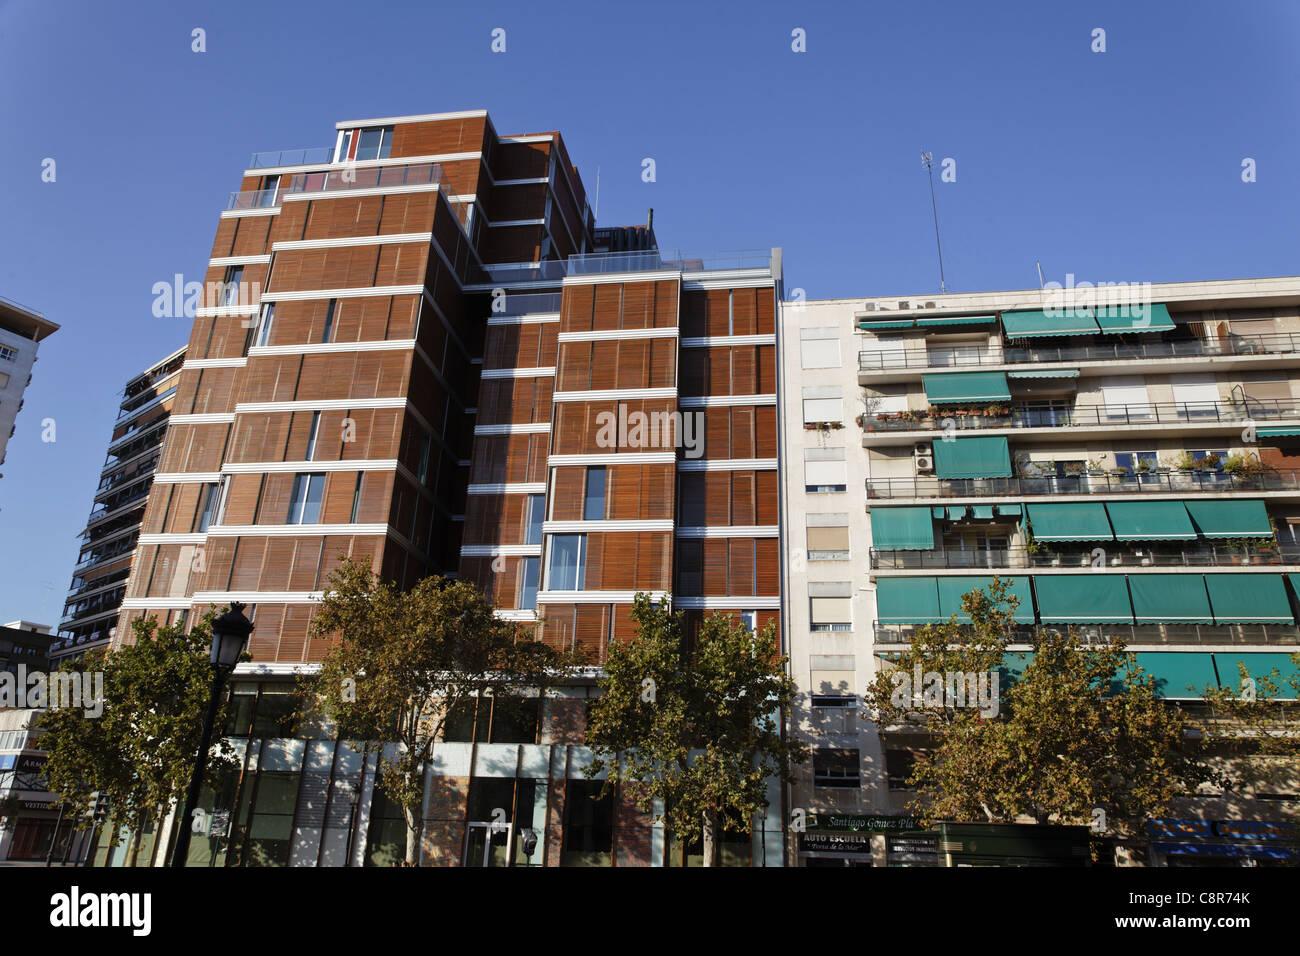 Plaza Porta del Mar, moderne Architektur, Immobilien, Valencia, Spanien Stockbild